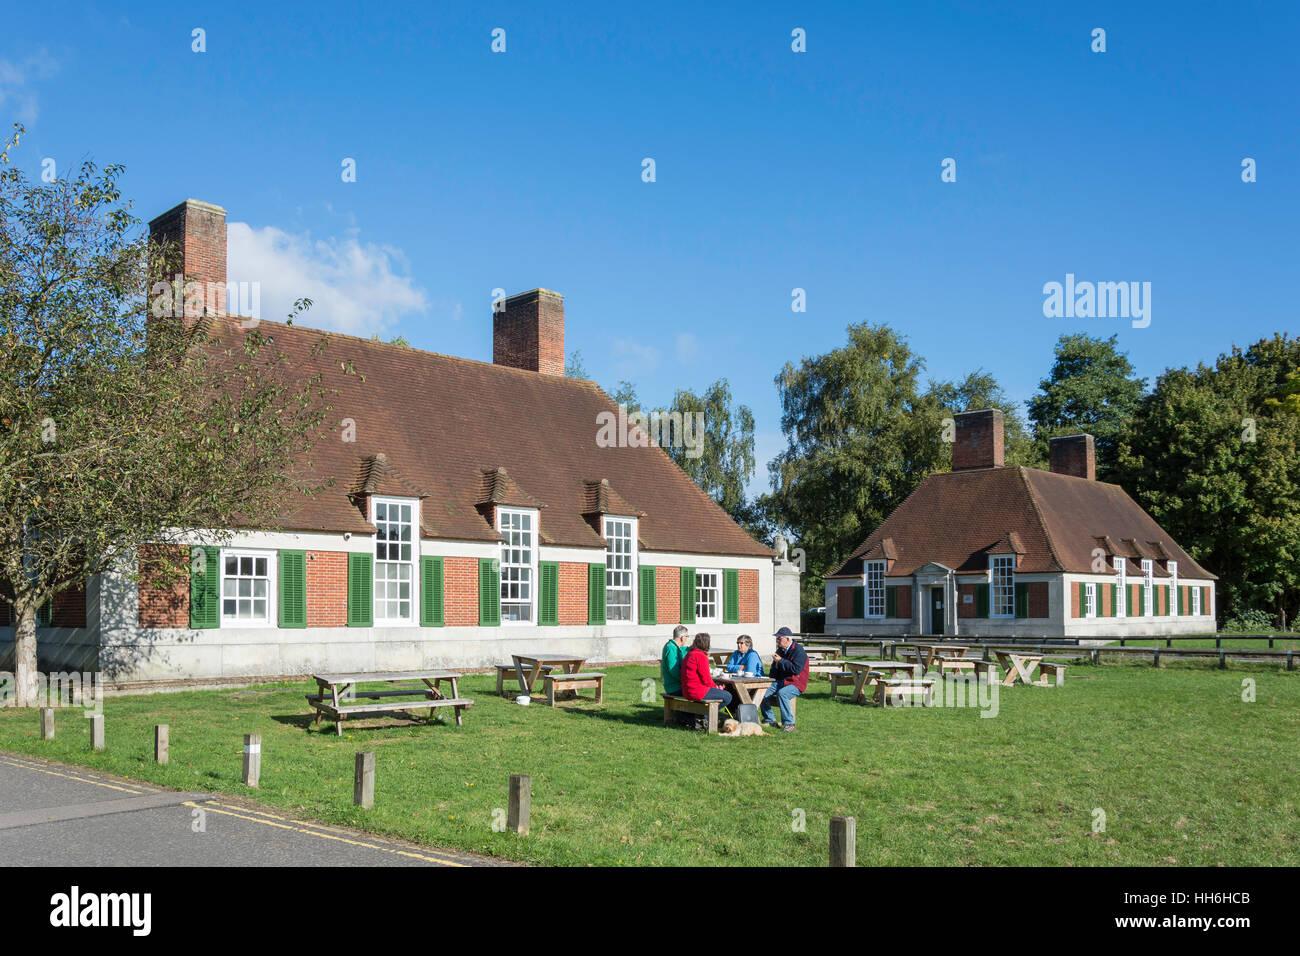 Garden at Magna Carta Tearoom, Windsor Road, Runnymede, Surrey, England, United Kingdom - Stock Image